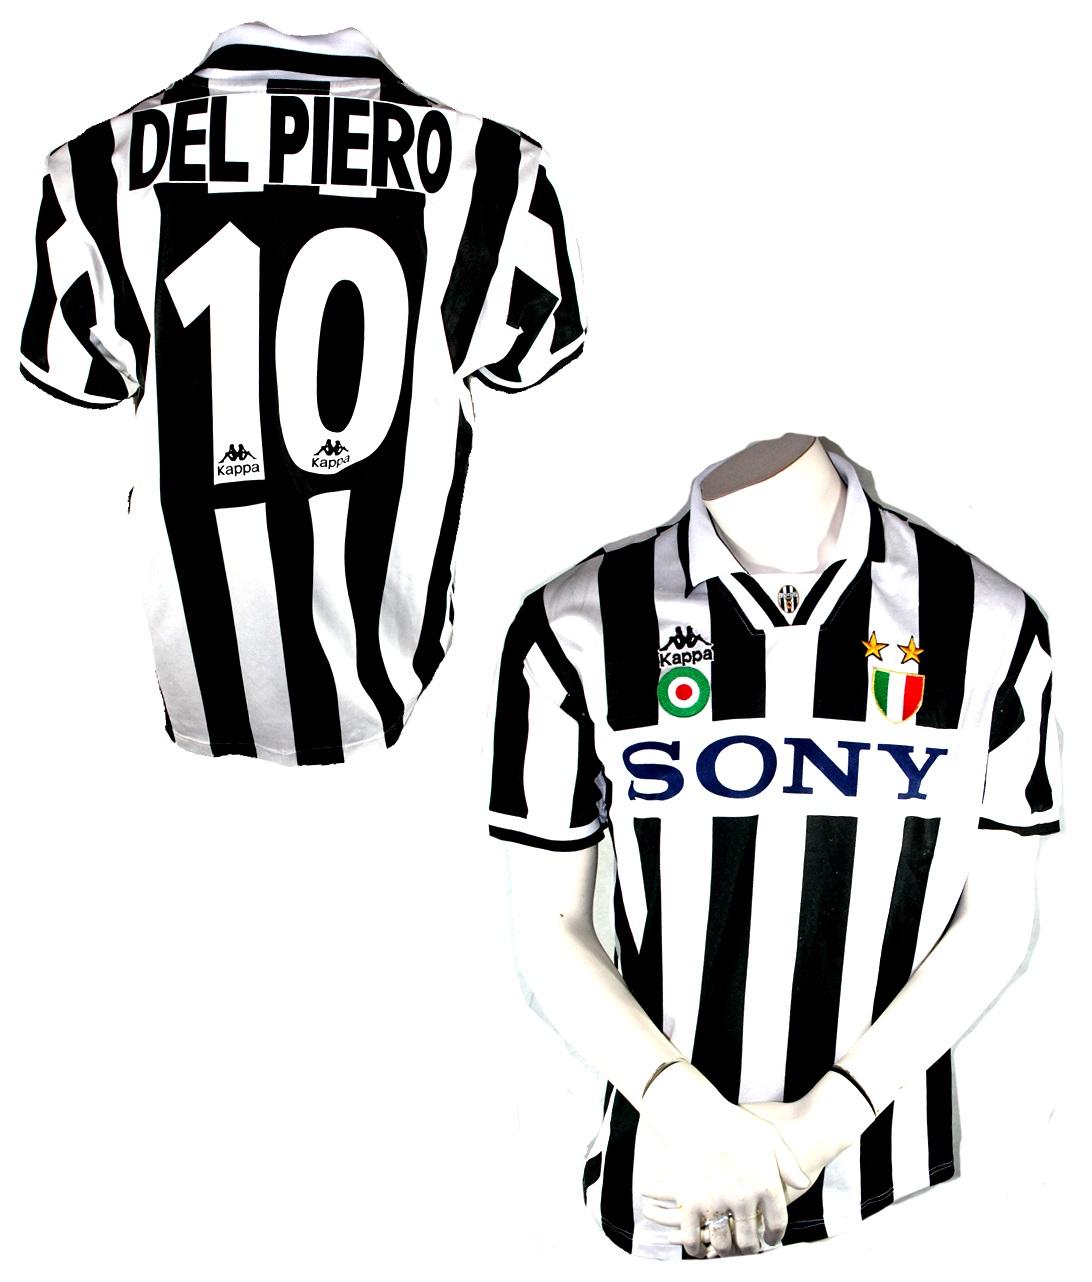 new product 35ddc db987 Kappa Juventus Turin jersey 10 Del Piero Alessandro 1995/96 ...